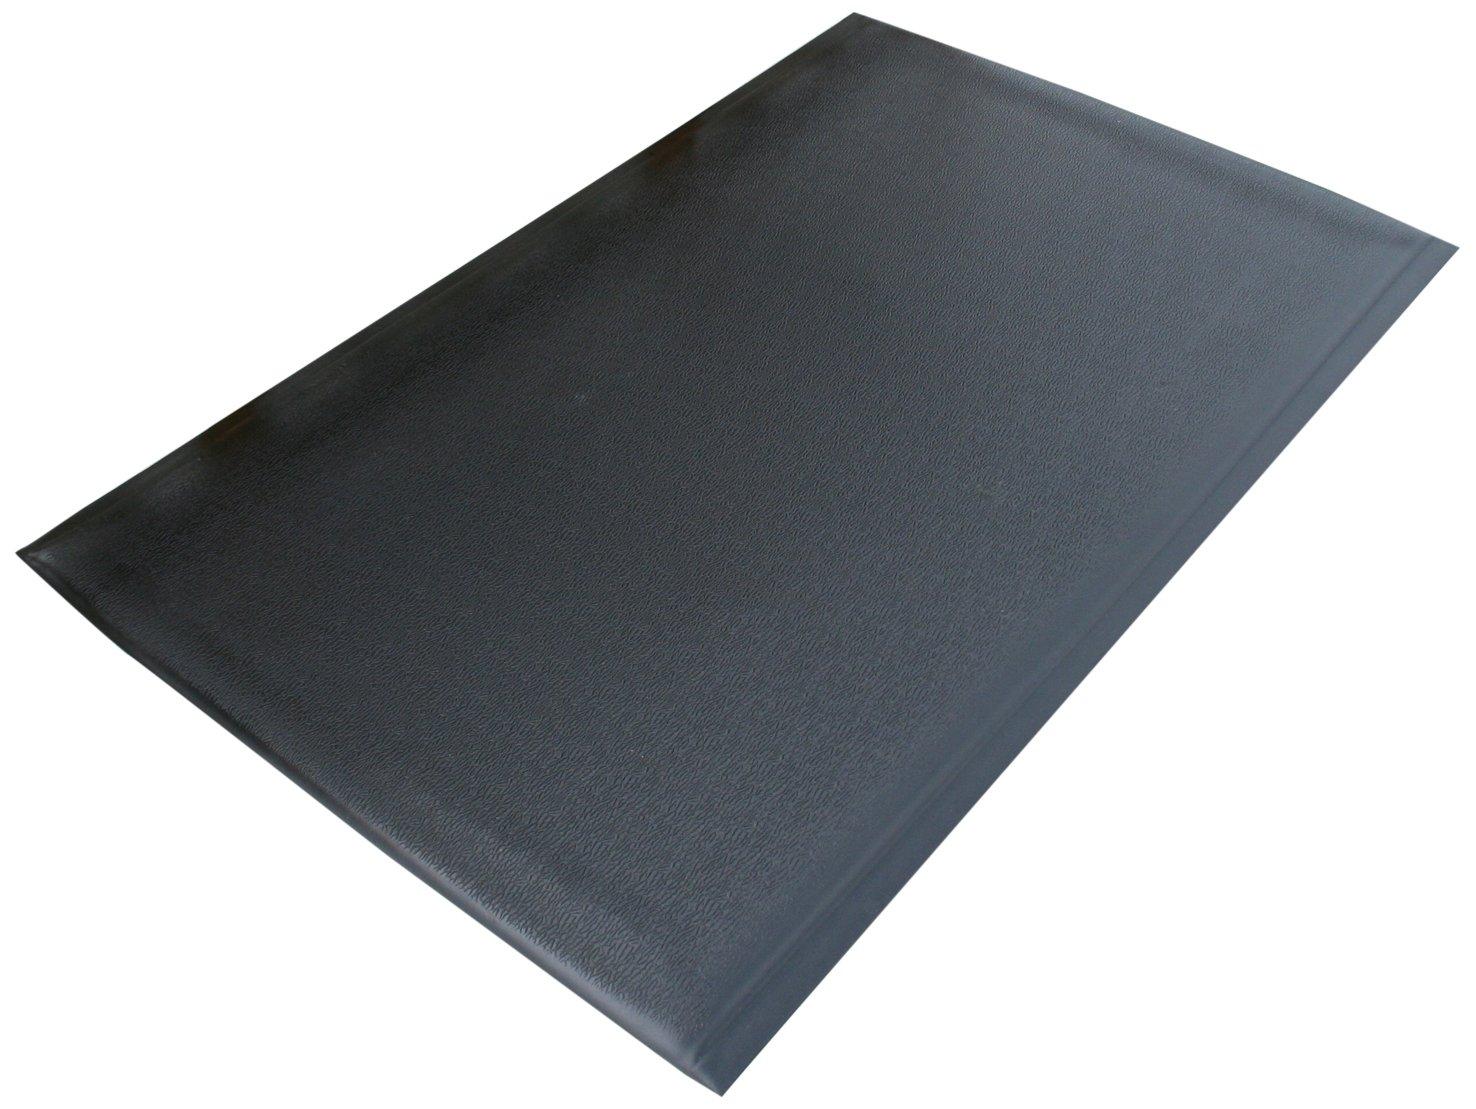 Rhino Mats Ds 210 Dura Step Anti Fatigue Mat 2 Width X 10 Length X 1 2 Thickness Black Floor Matting Amazon Com Industrial Scientific